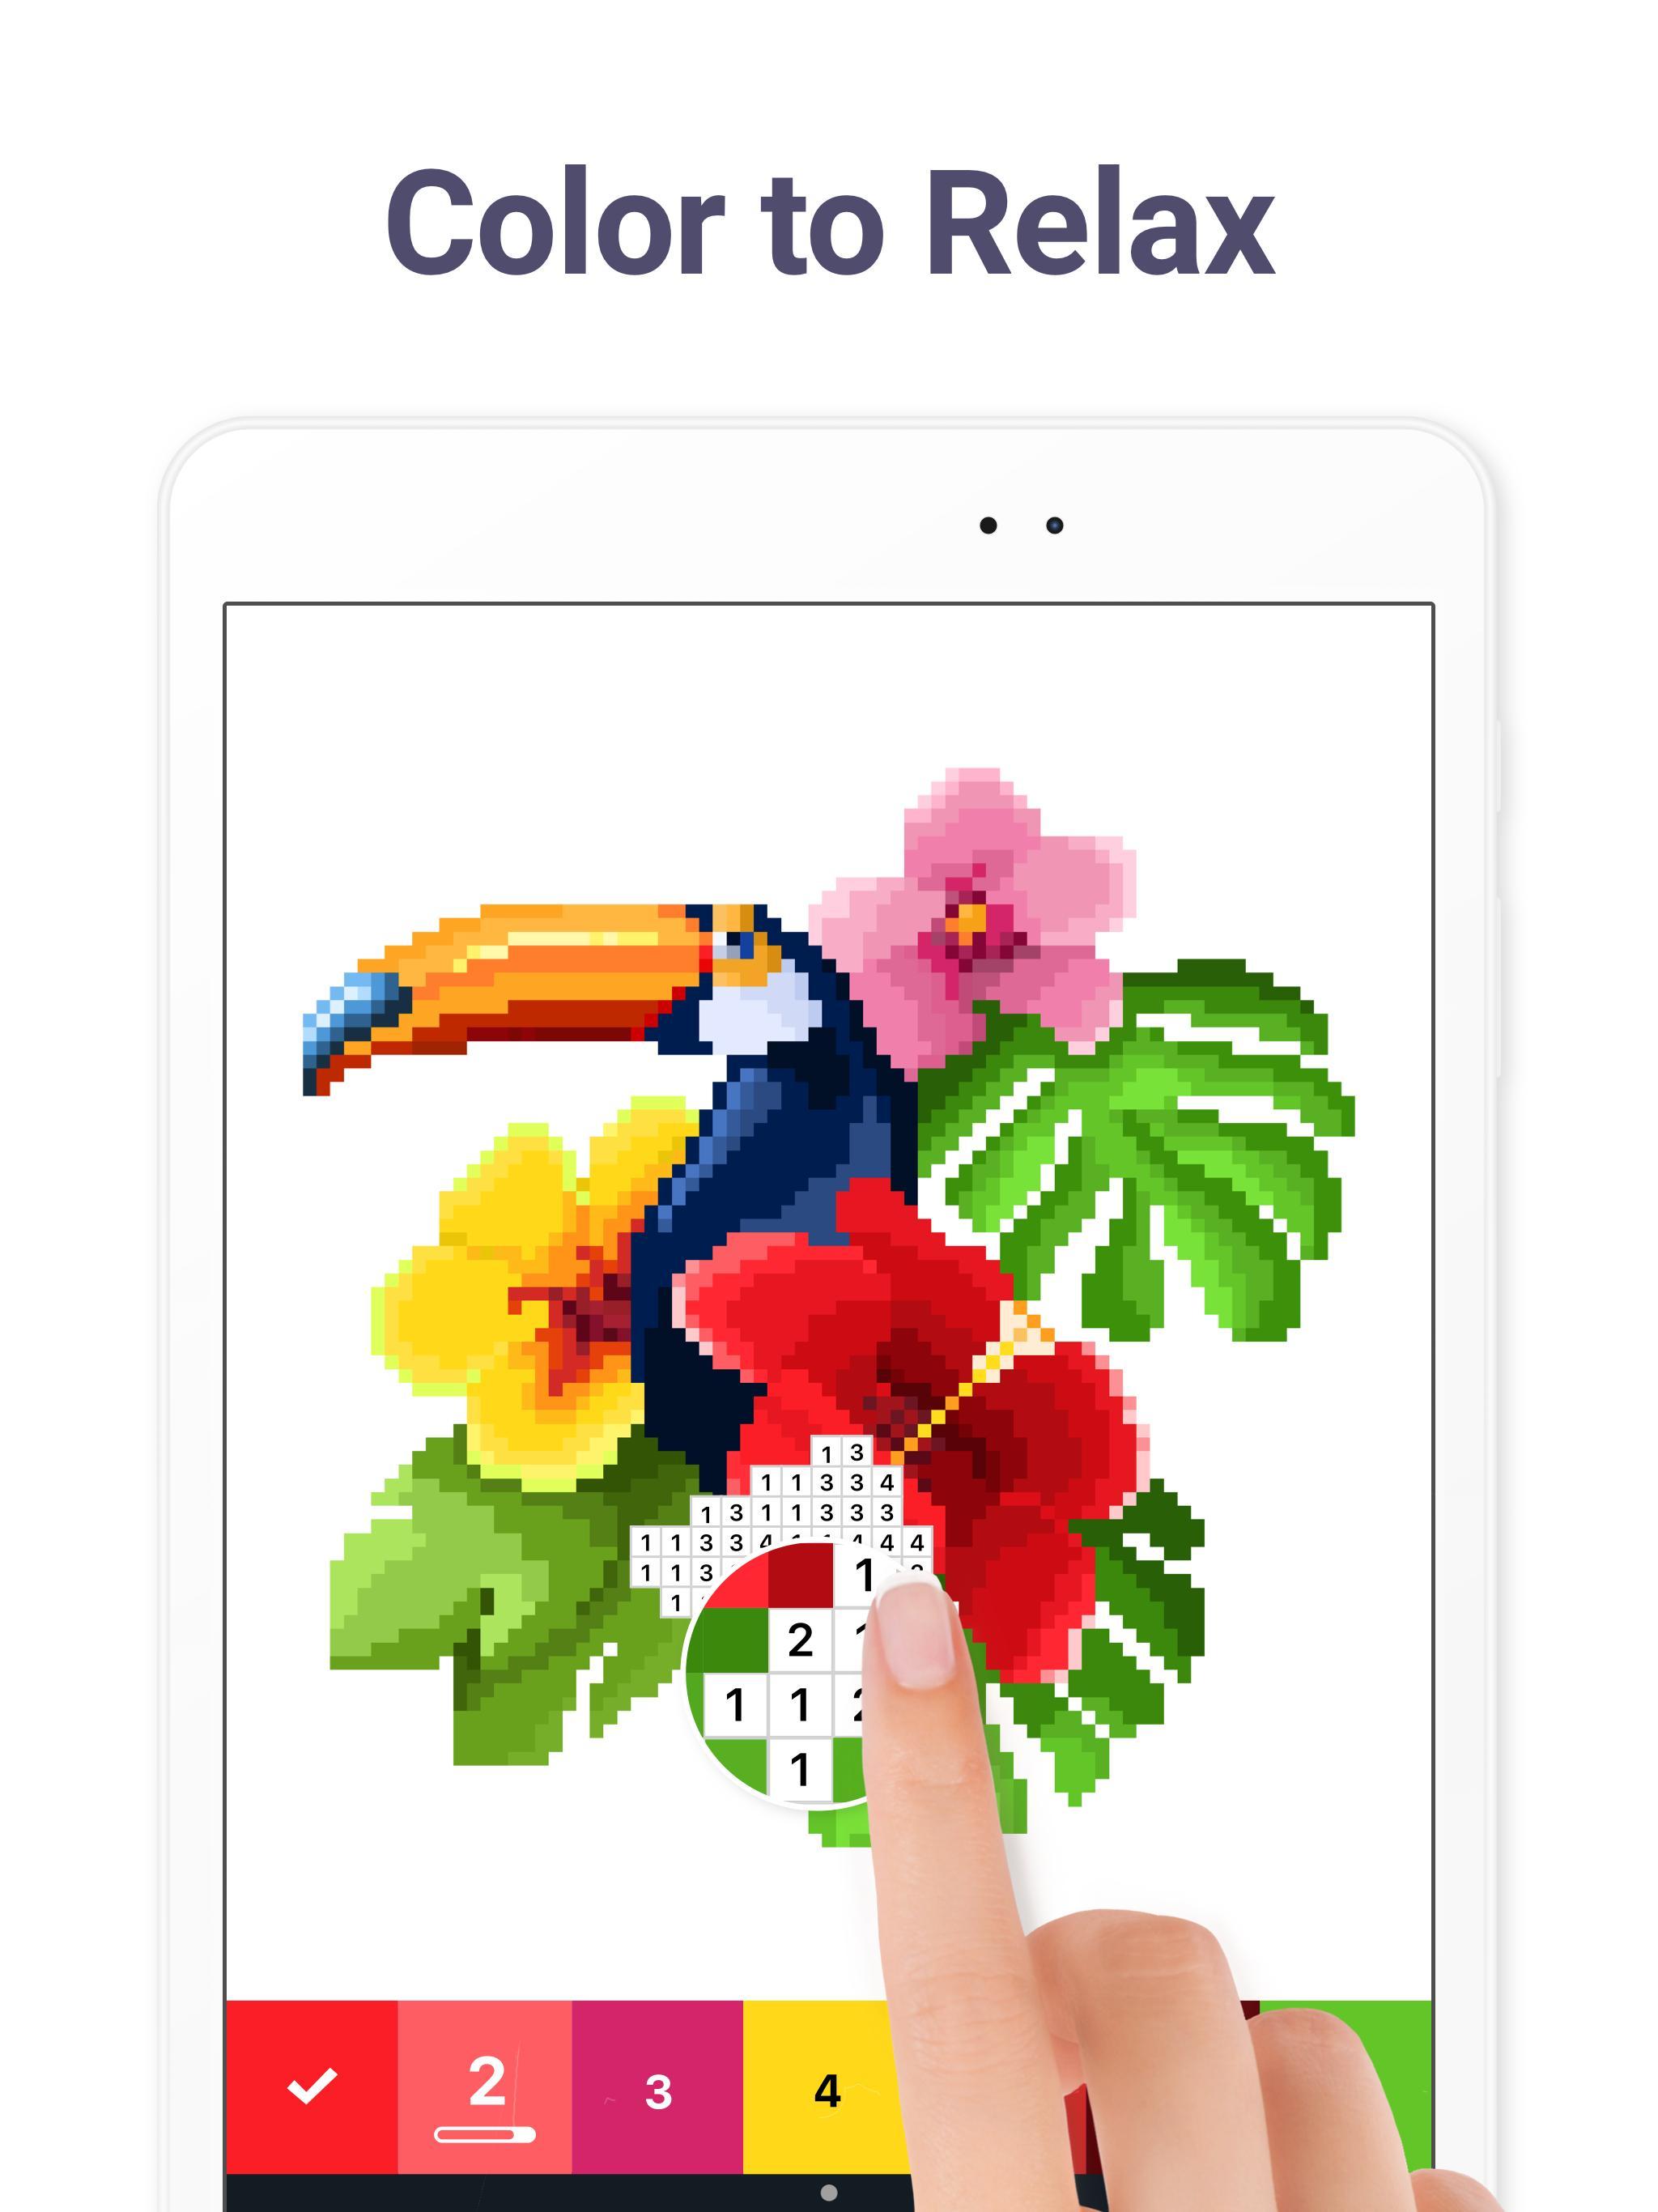 Pixel Art Color by Number 6.6.1 Screenshot 17